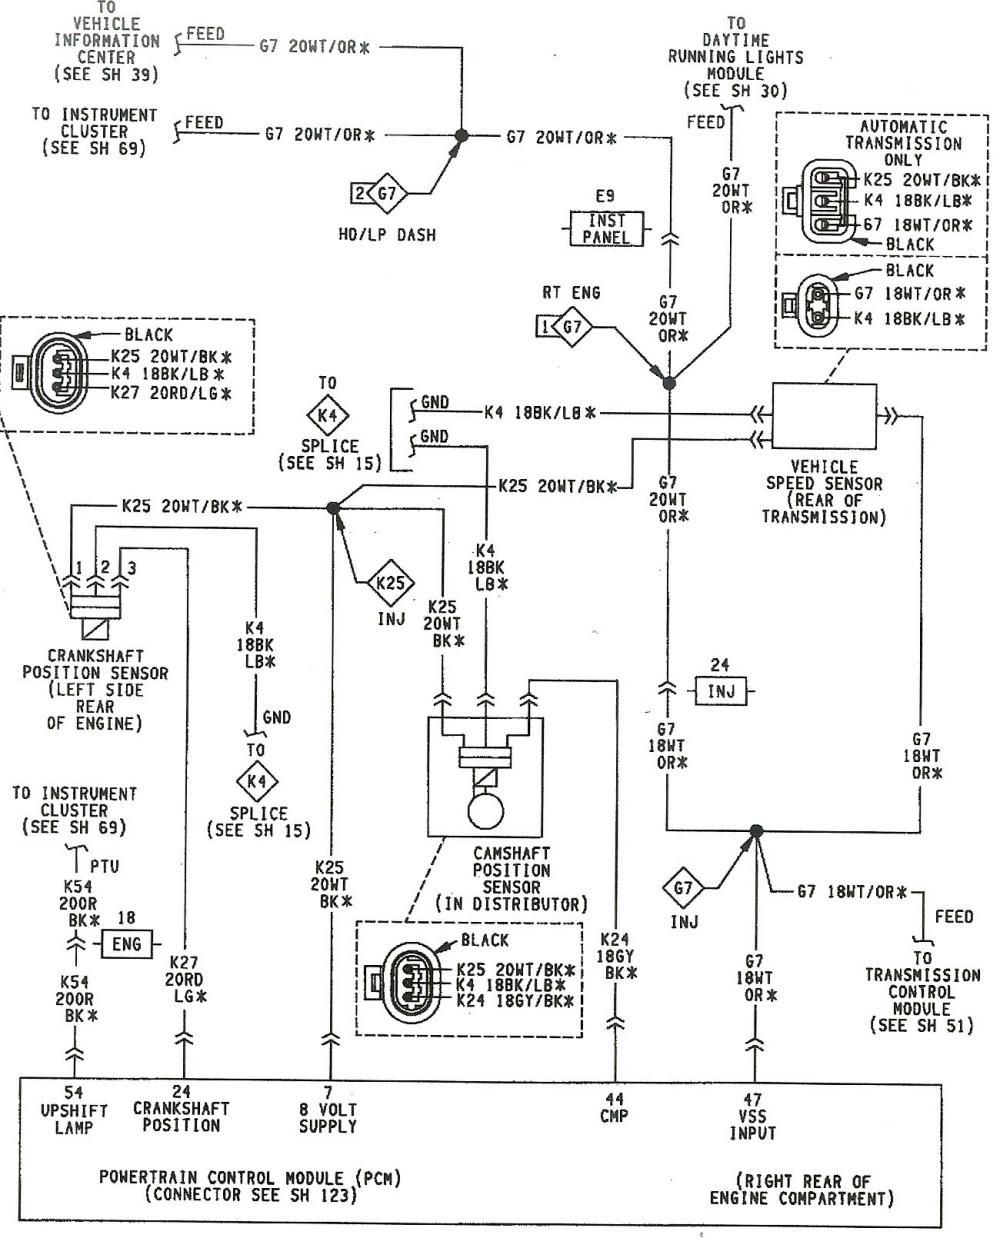 medium resolution of 2007 jeep grand cherokee engine diagram grand cherokee i have a 93 jeep grand cherokee with